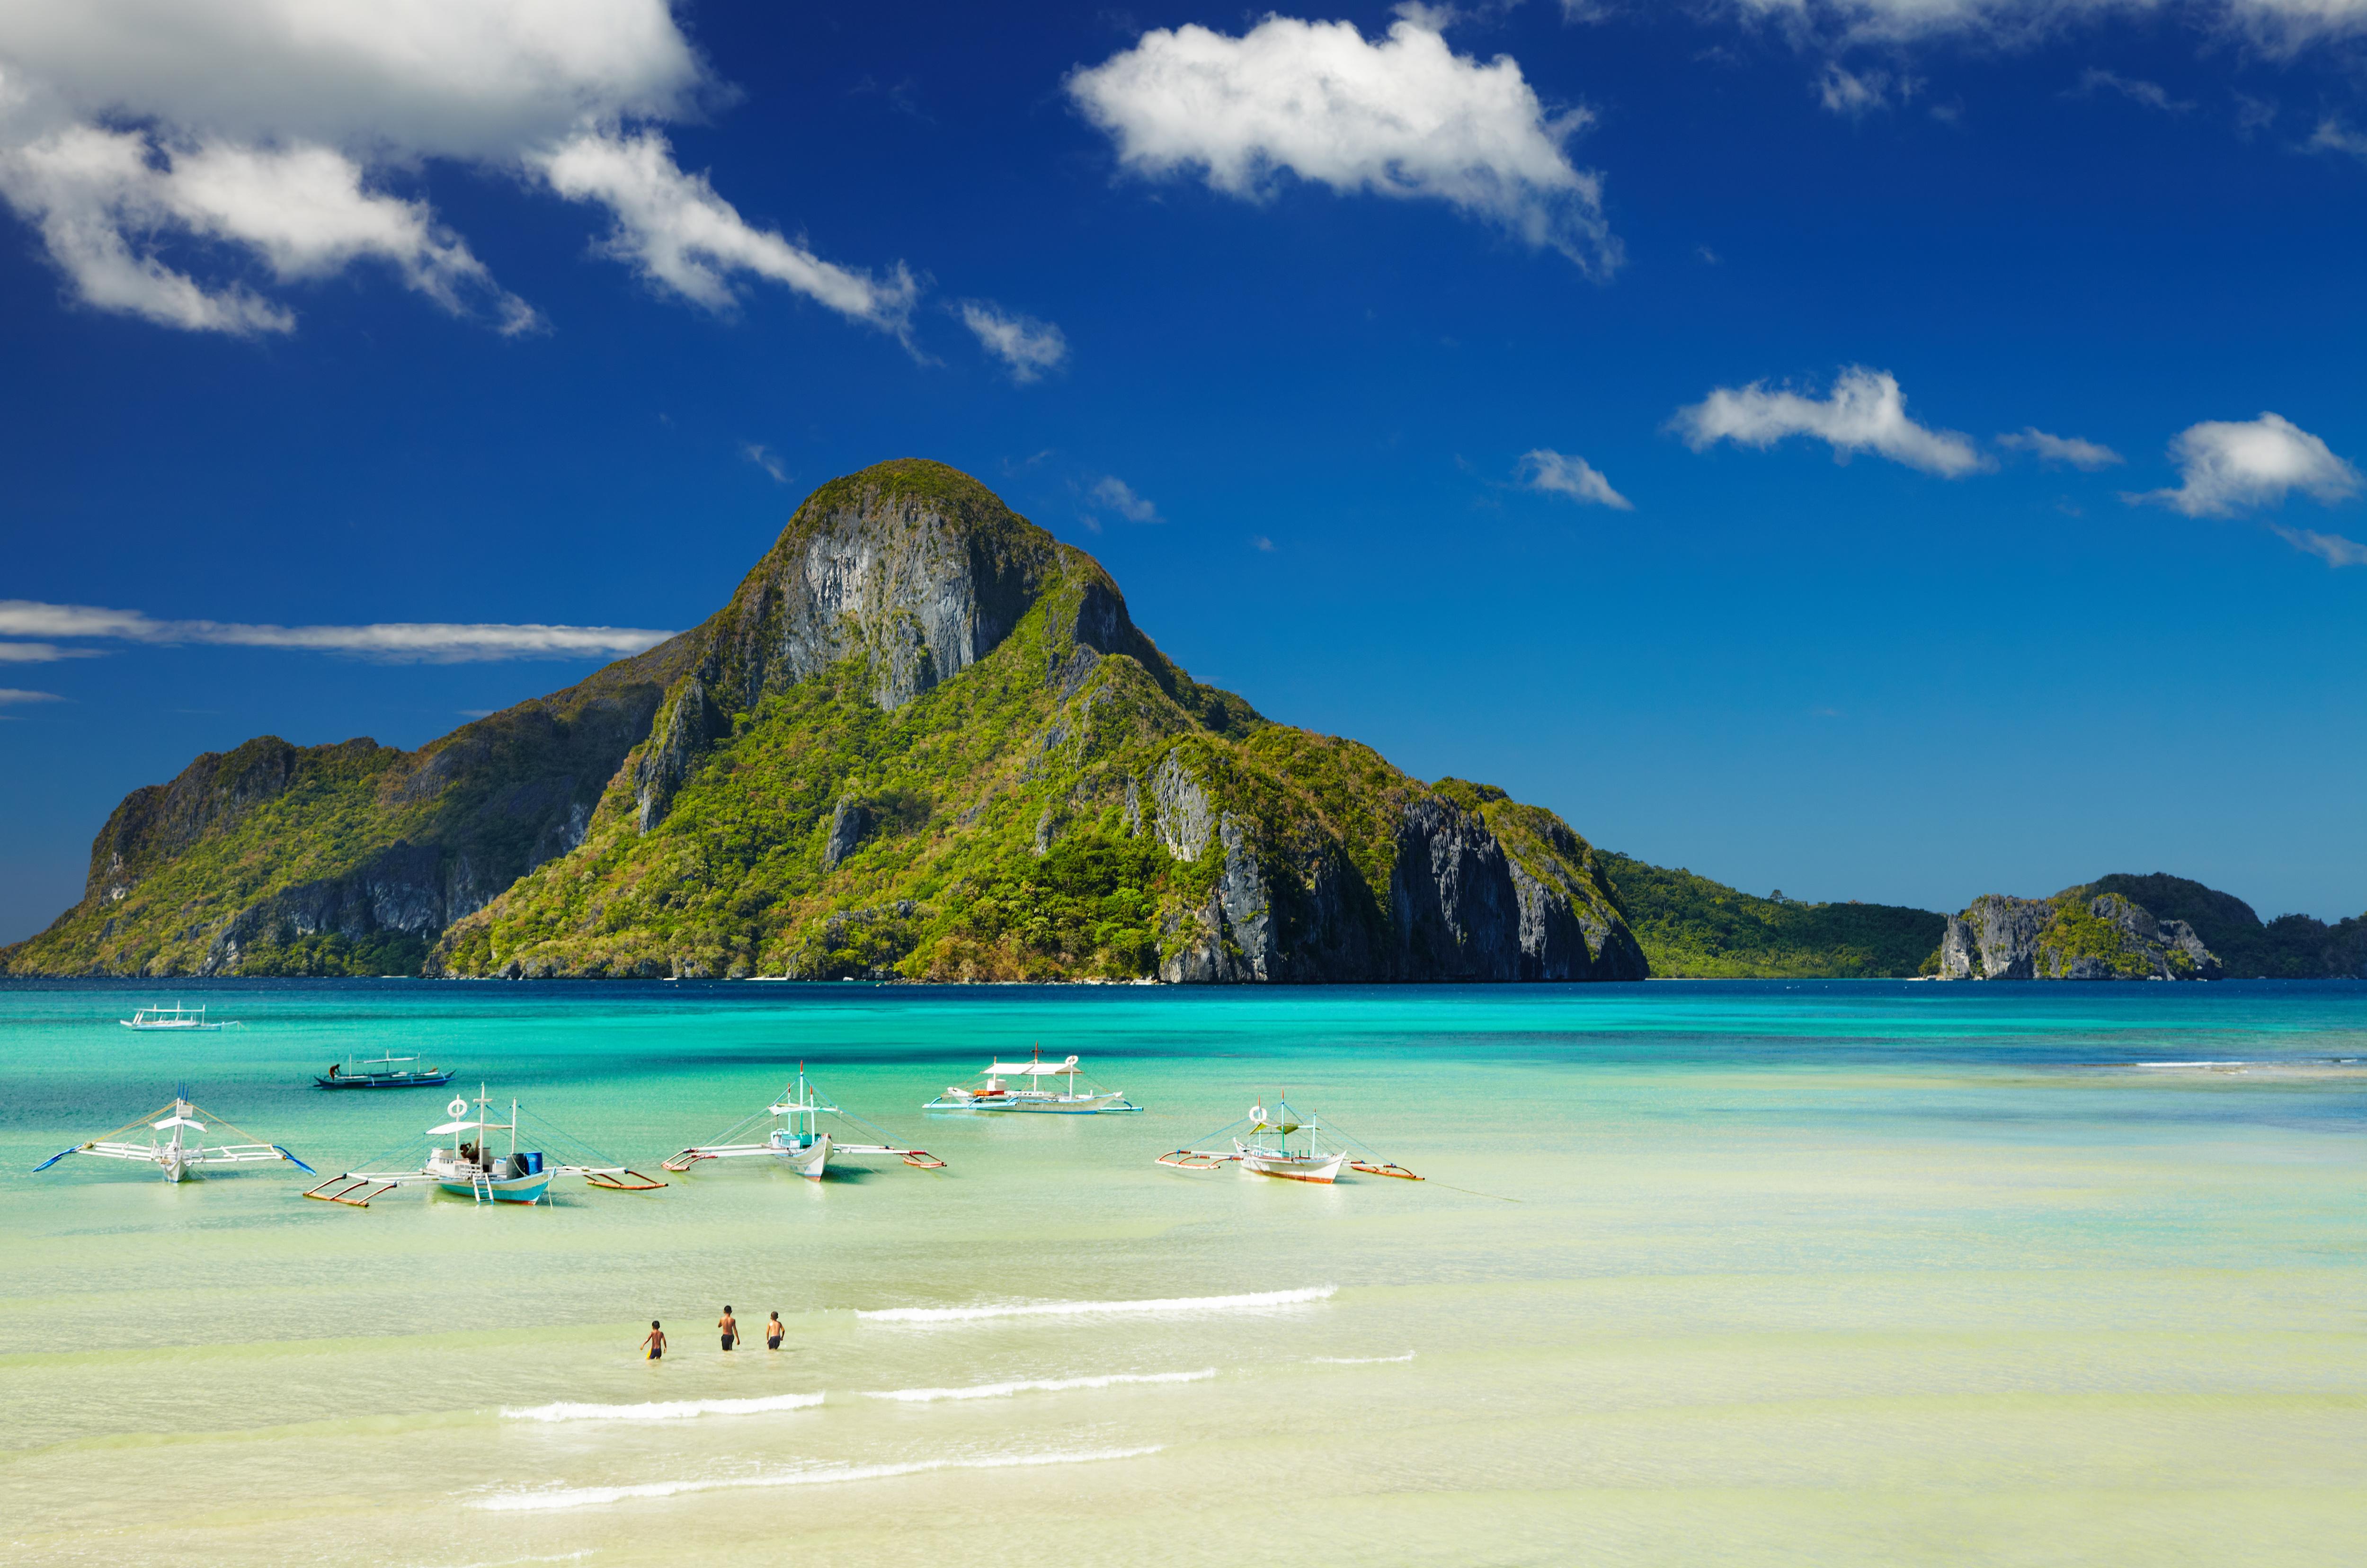 Palawan Island Image